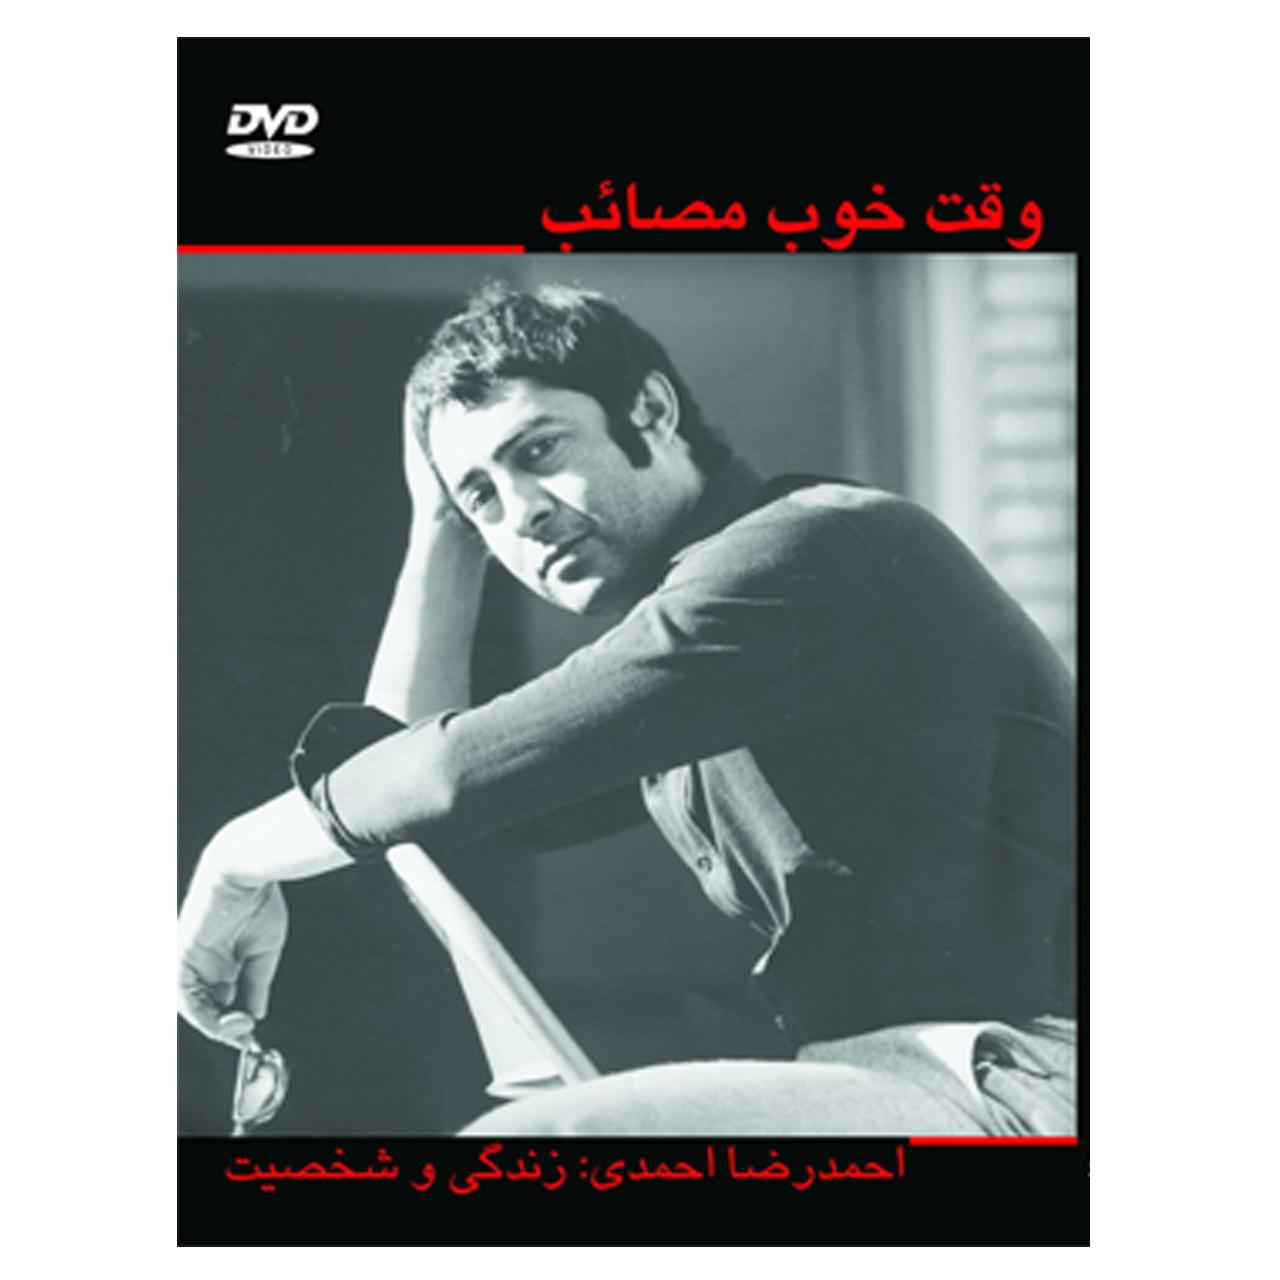 مستند وقت خوب مصائب اثر ناصر صفاریان